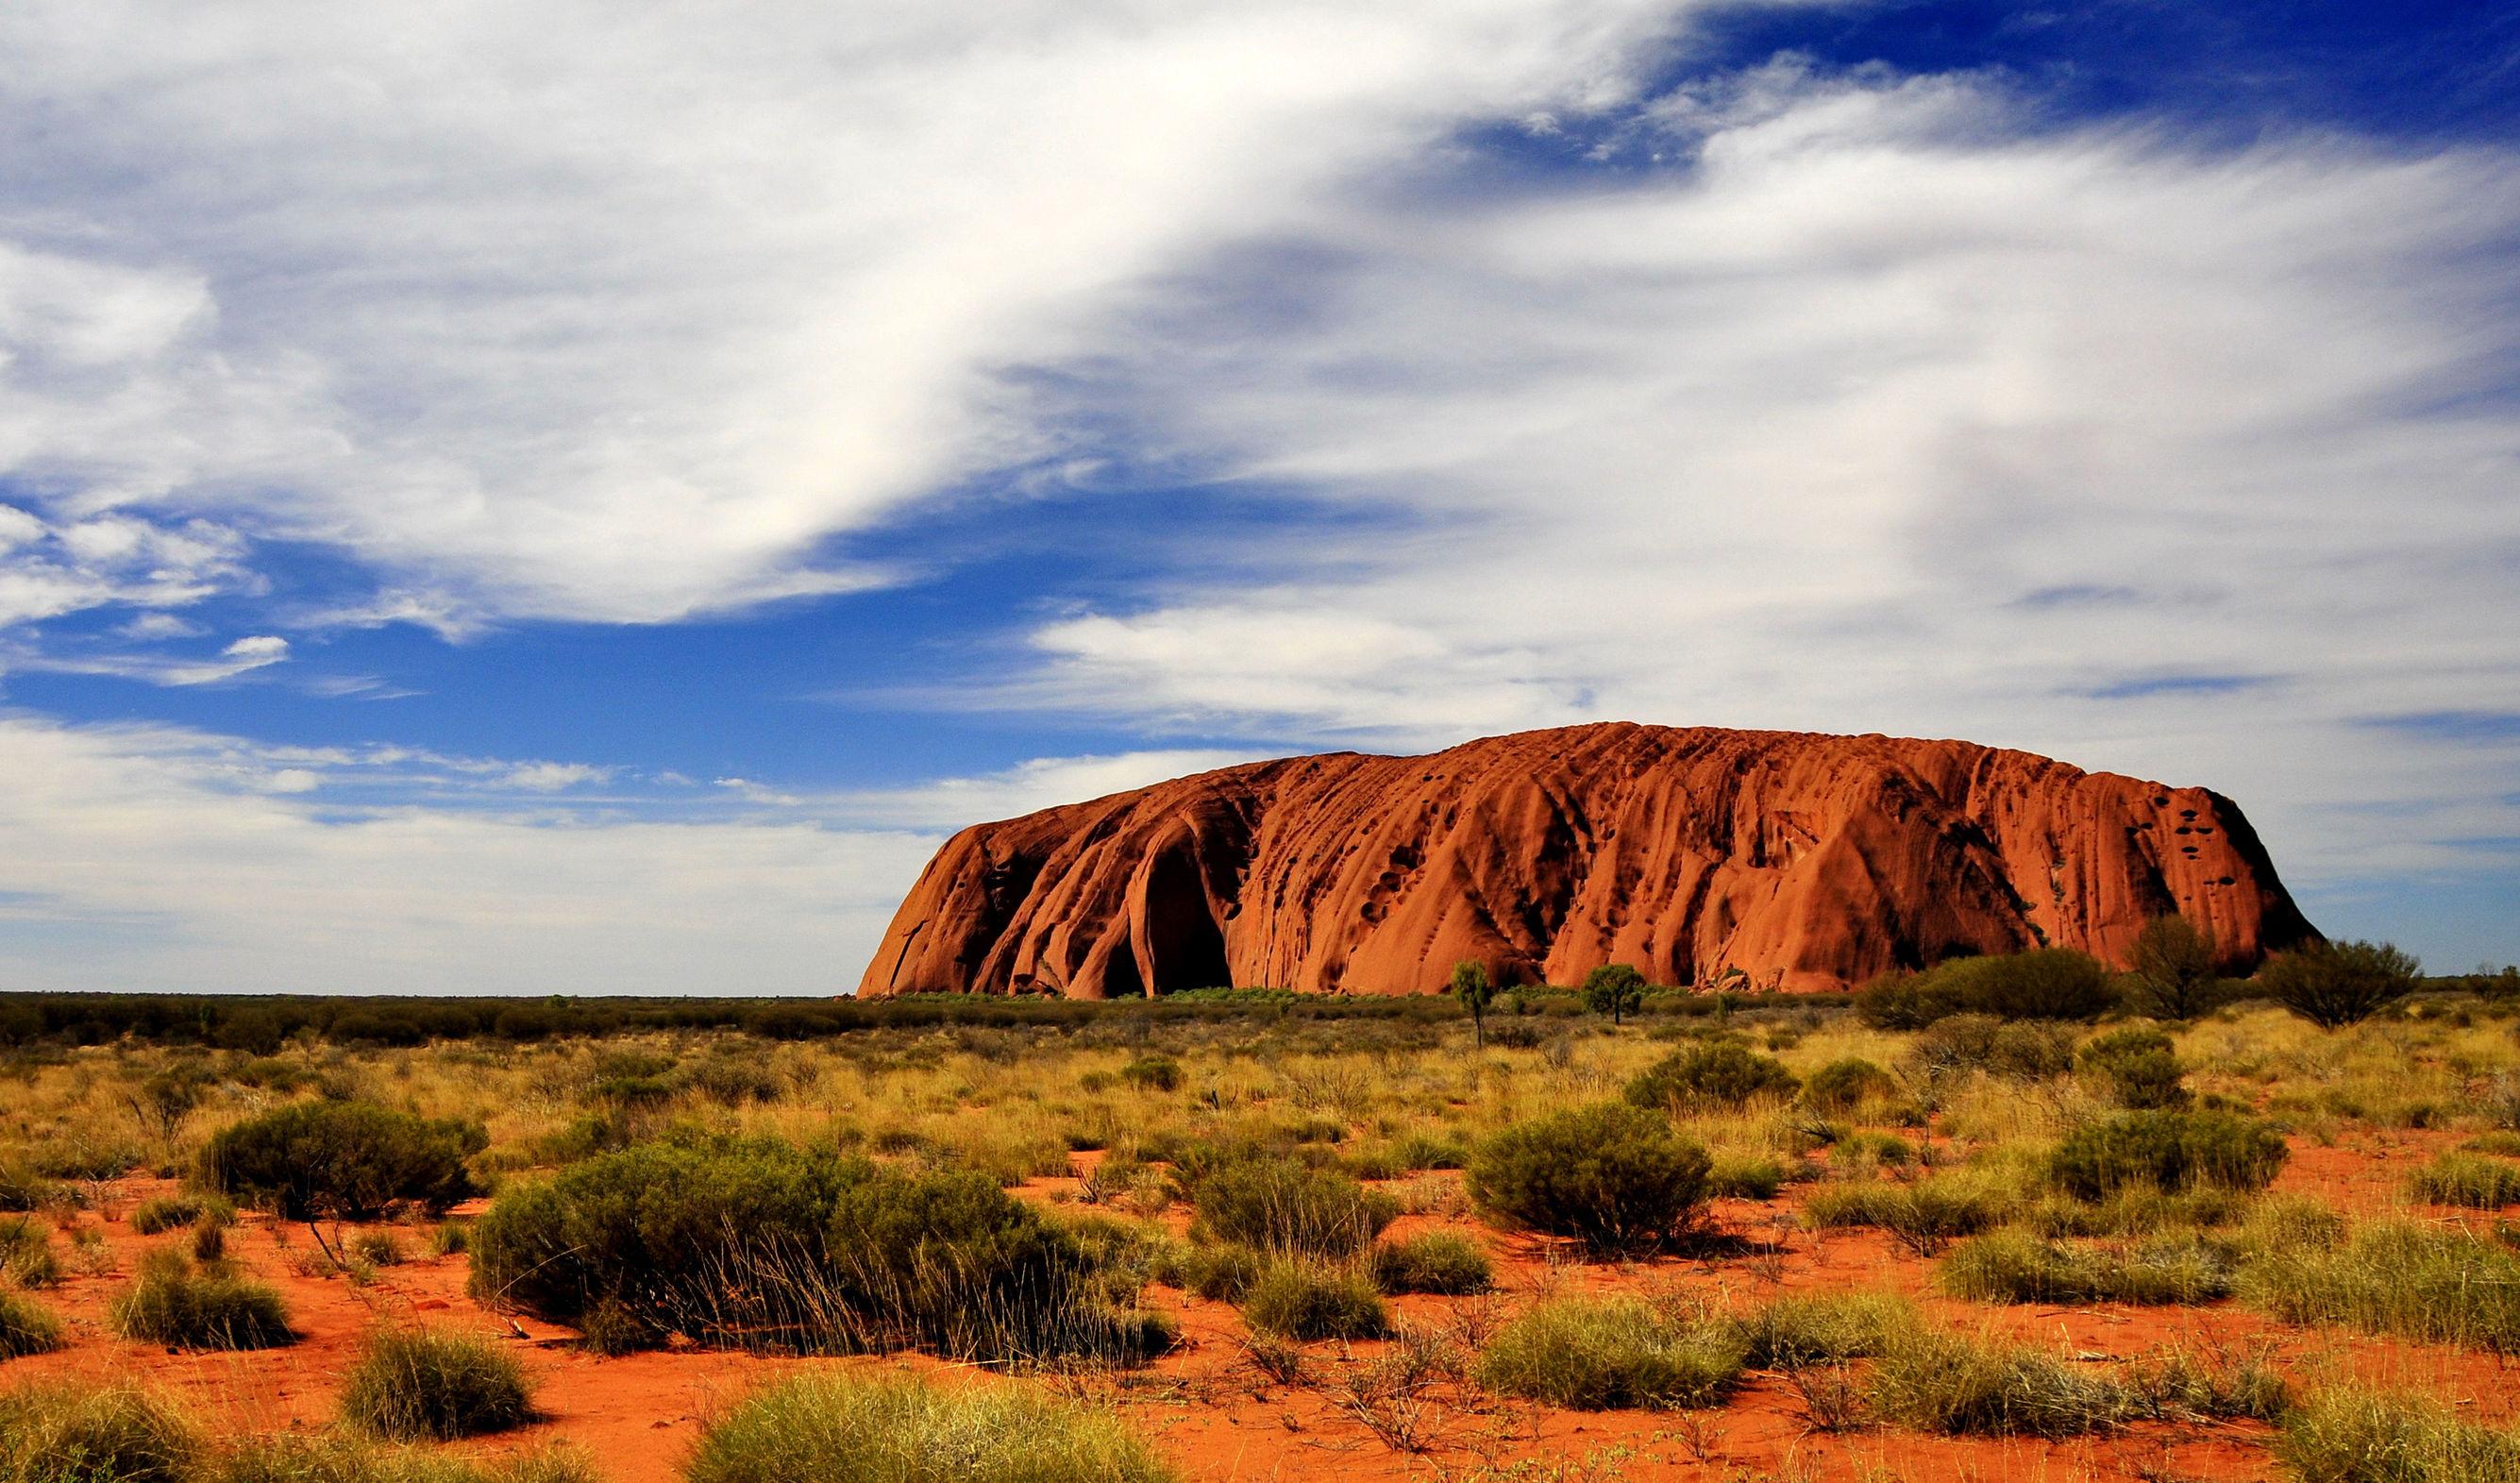 ayers-rock-australia 123rf